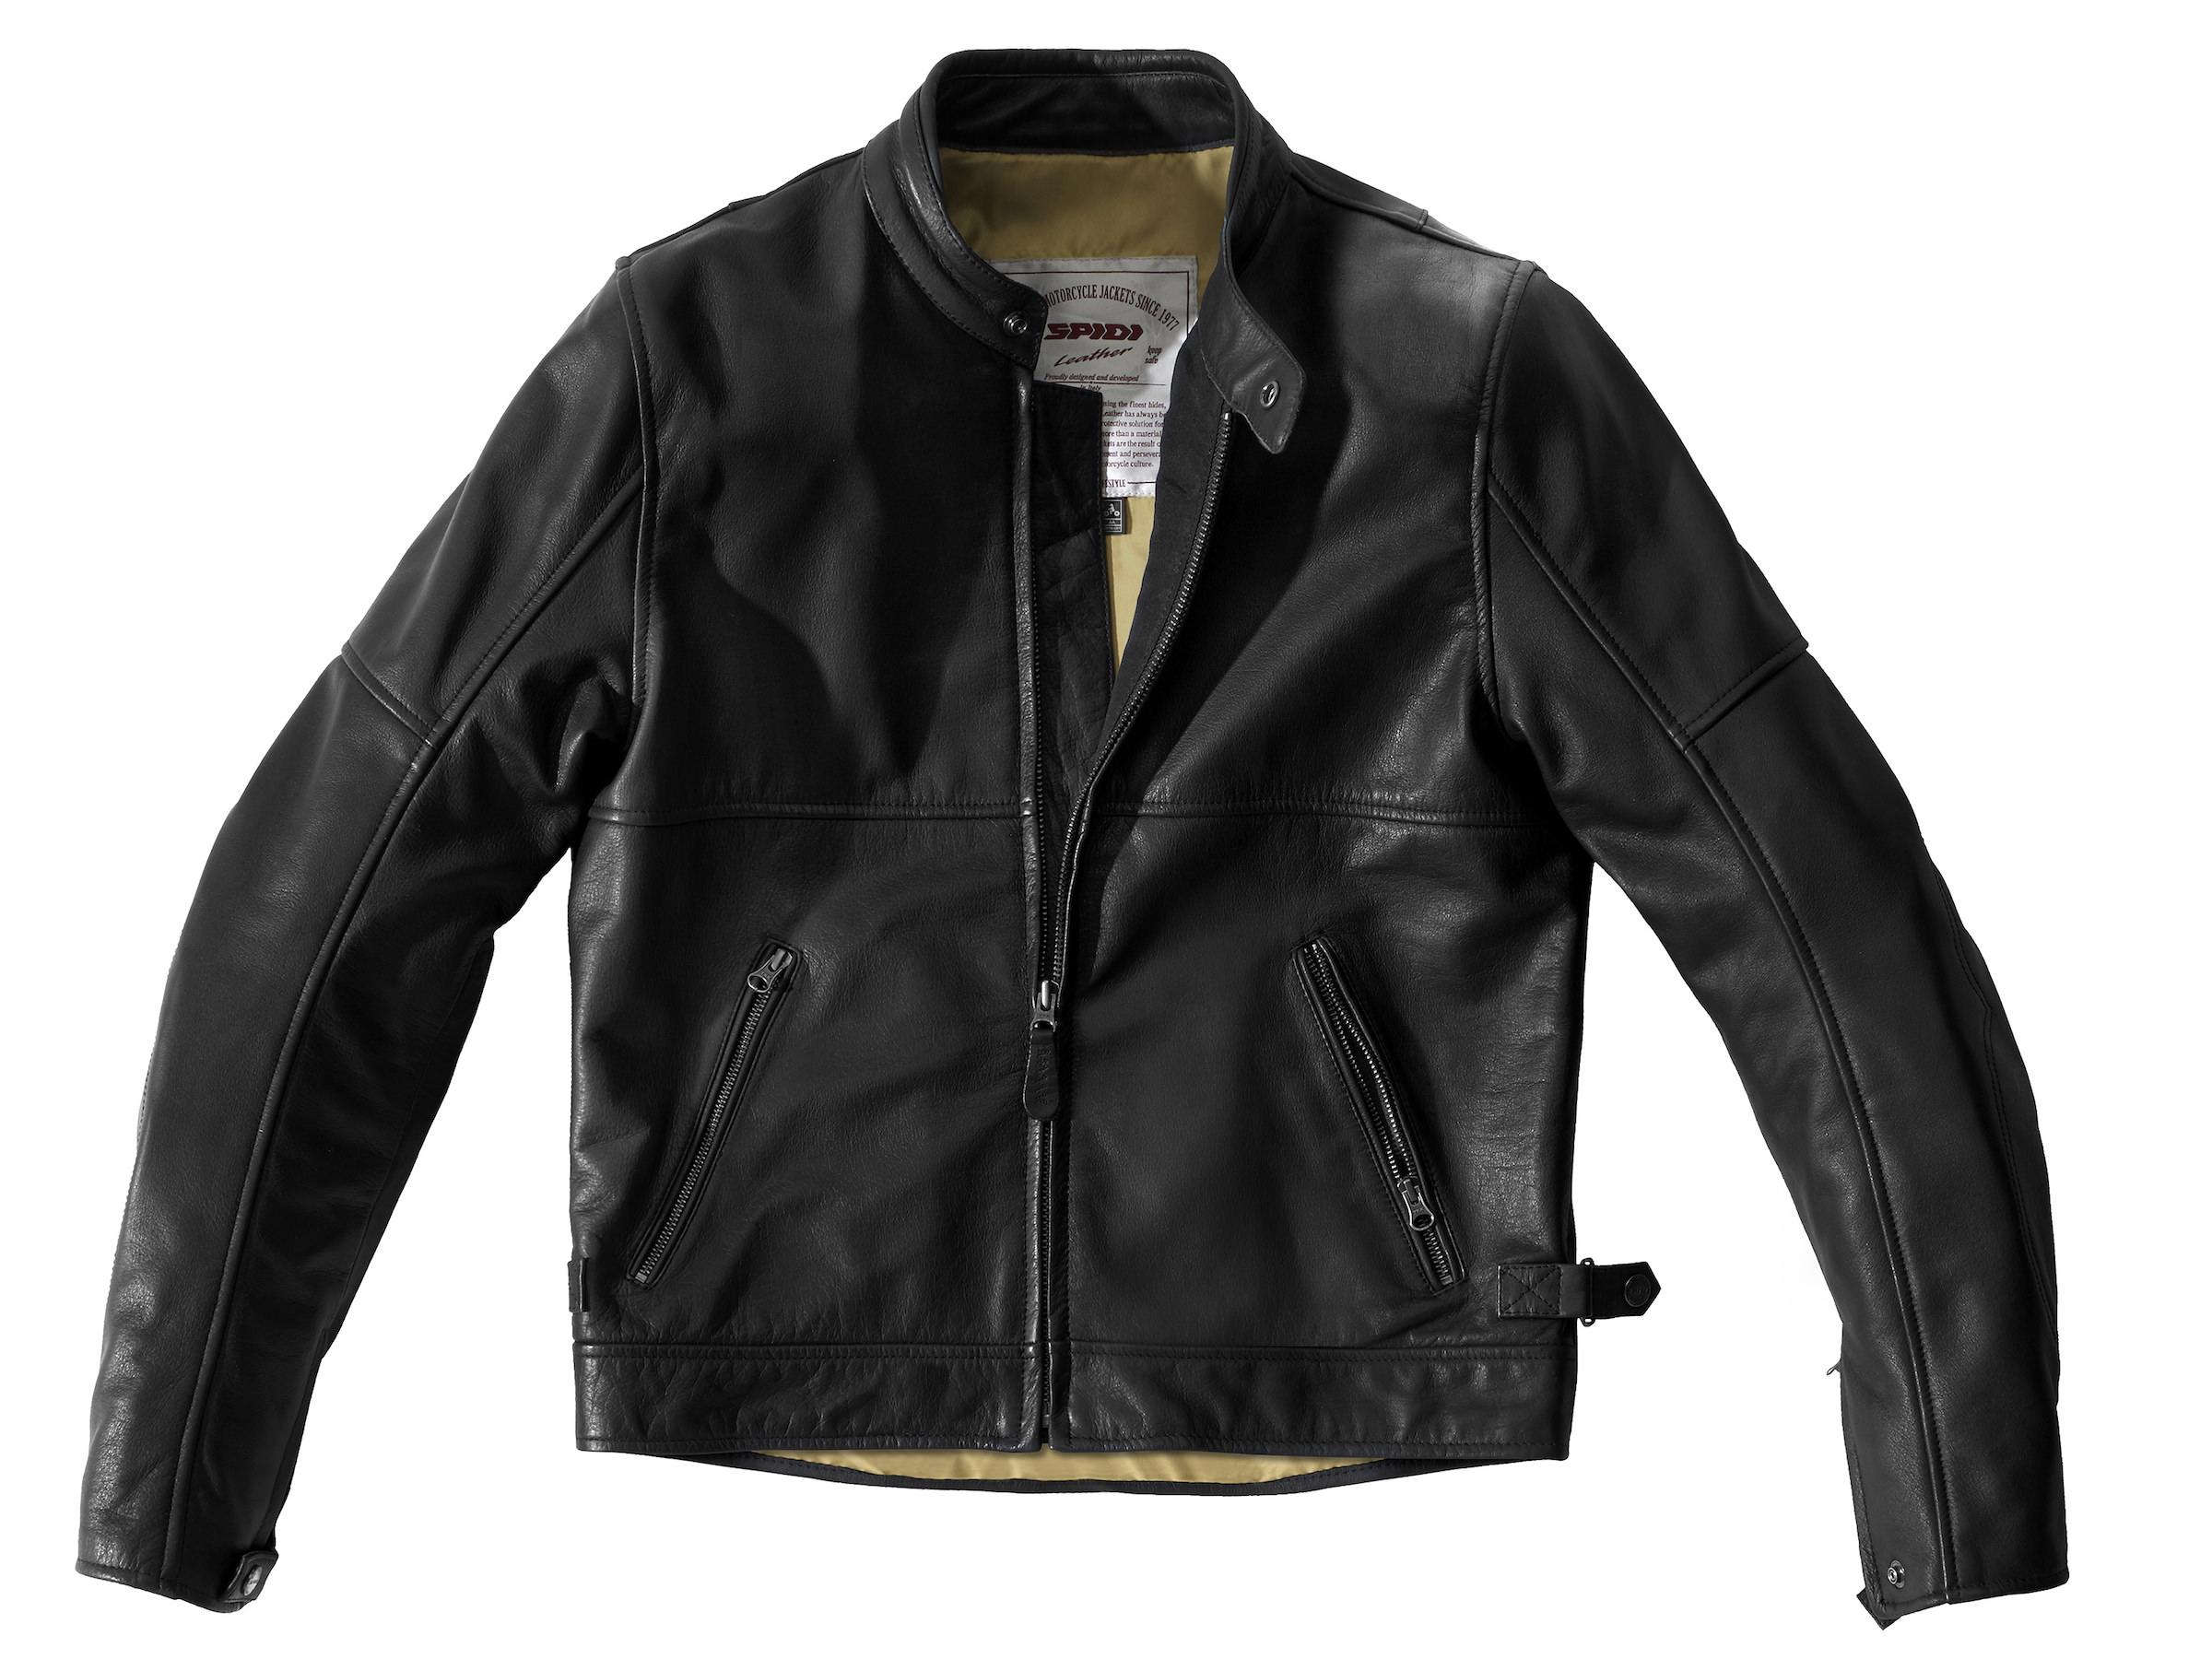 Spidi Rock Motorcycle Jacket - An Armored Italian Buffalo Leather Jacket